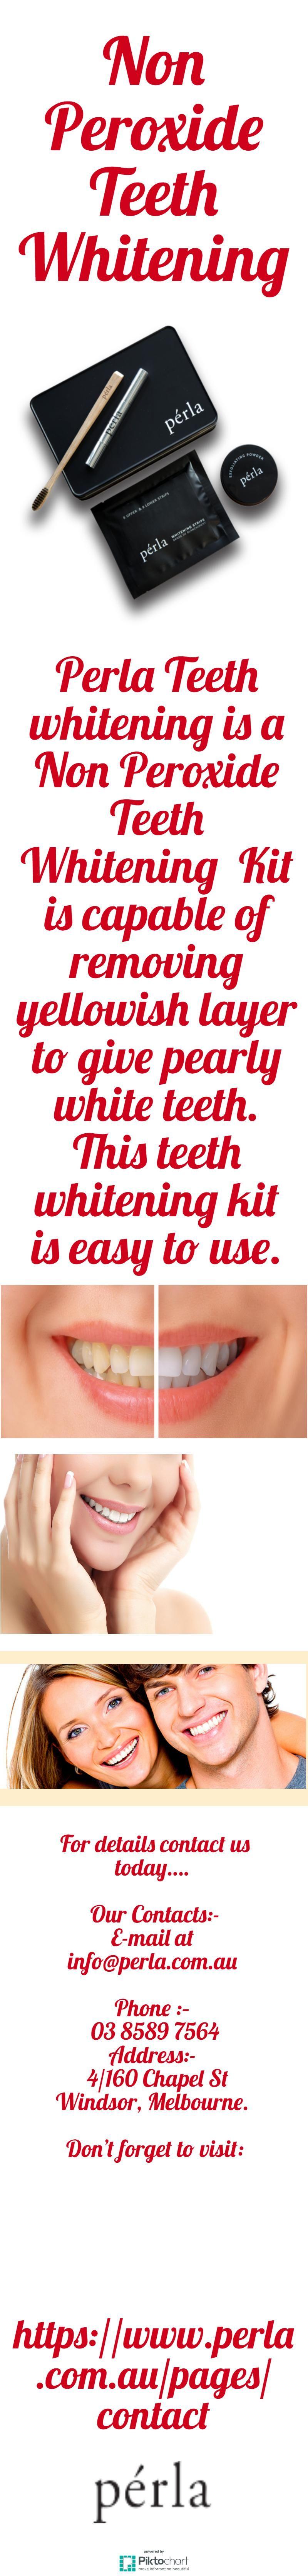 perla teeth whitening is a non peroxide teeth whitening kit is